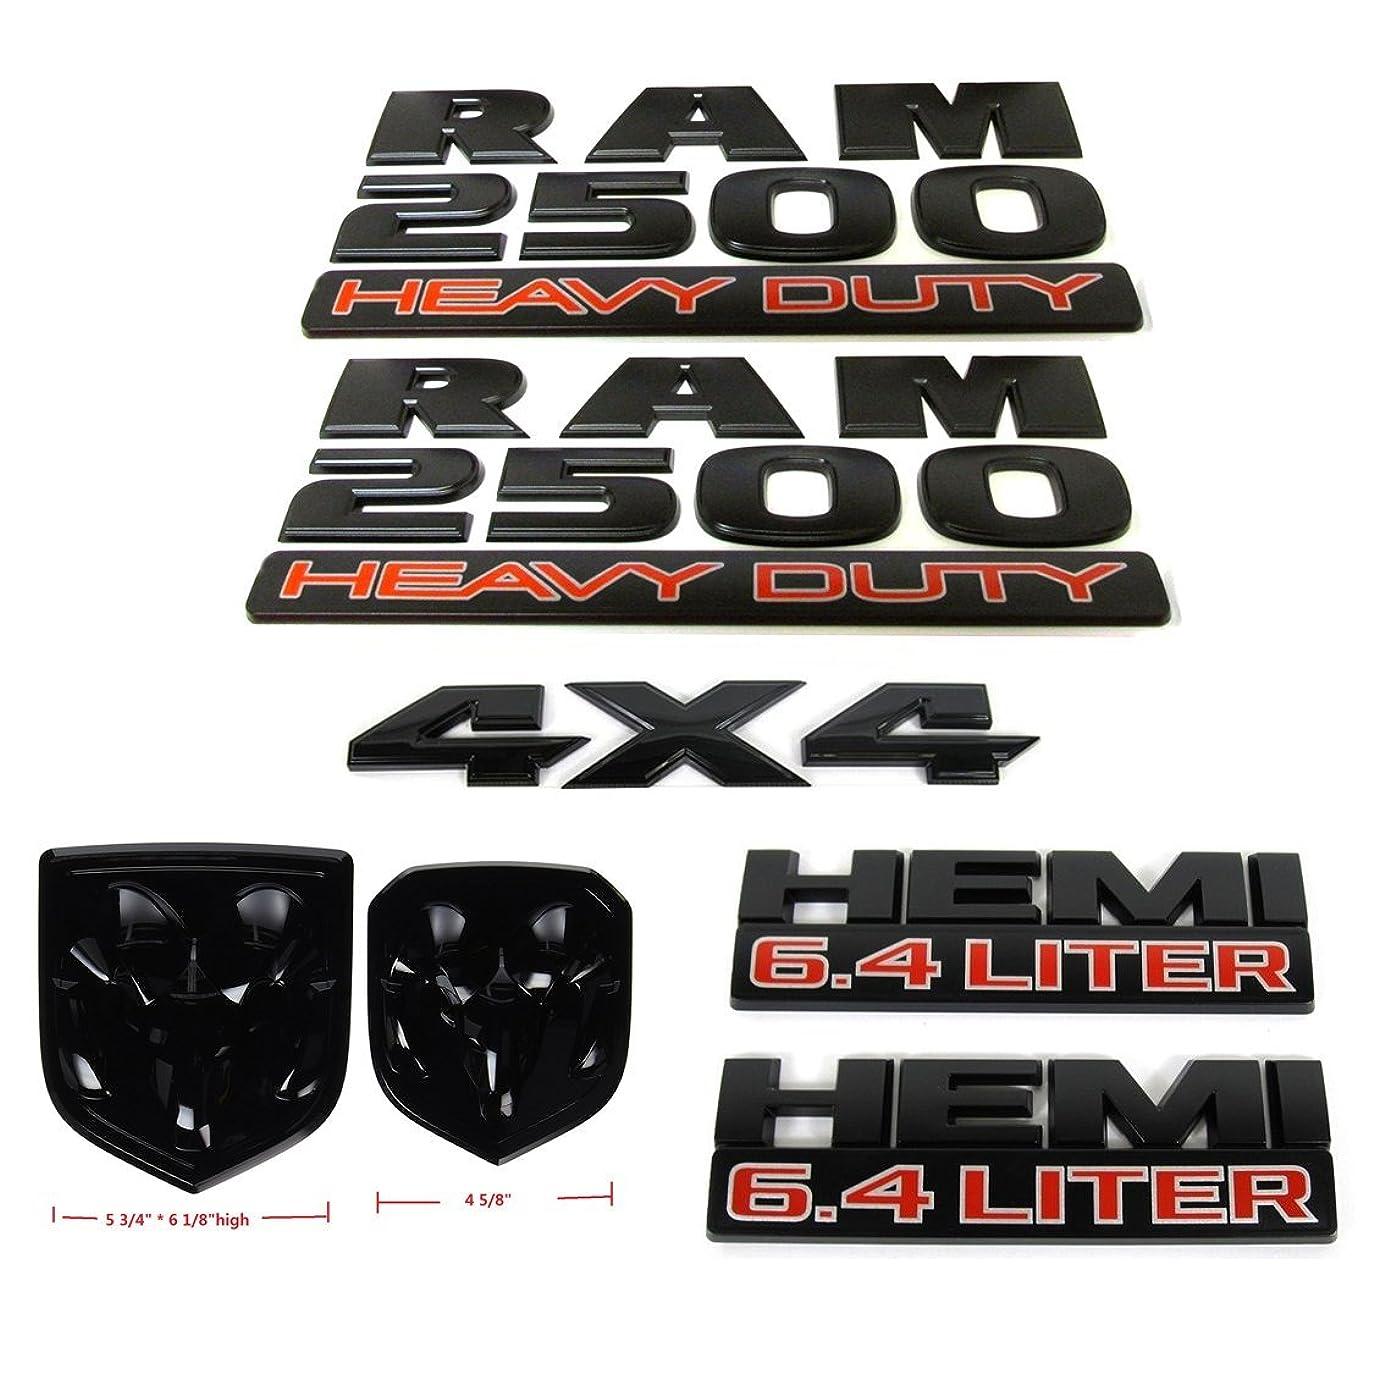 Set OEM Black RAM 2500 4X4 plus Grille Tailgate 6.4 Liter HEMI Emblems Badge Replacement for RAM 2500 2013-2018 Black nrrpue0280